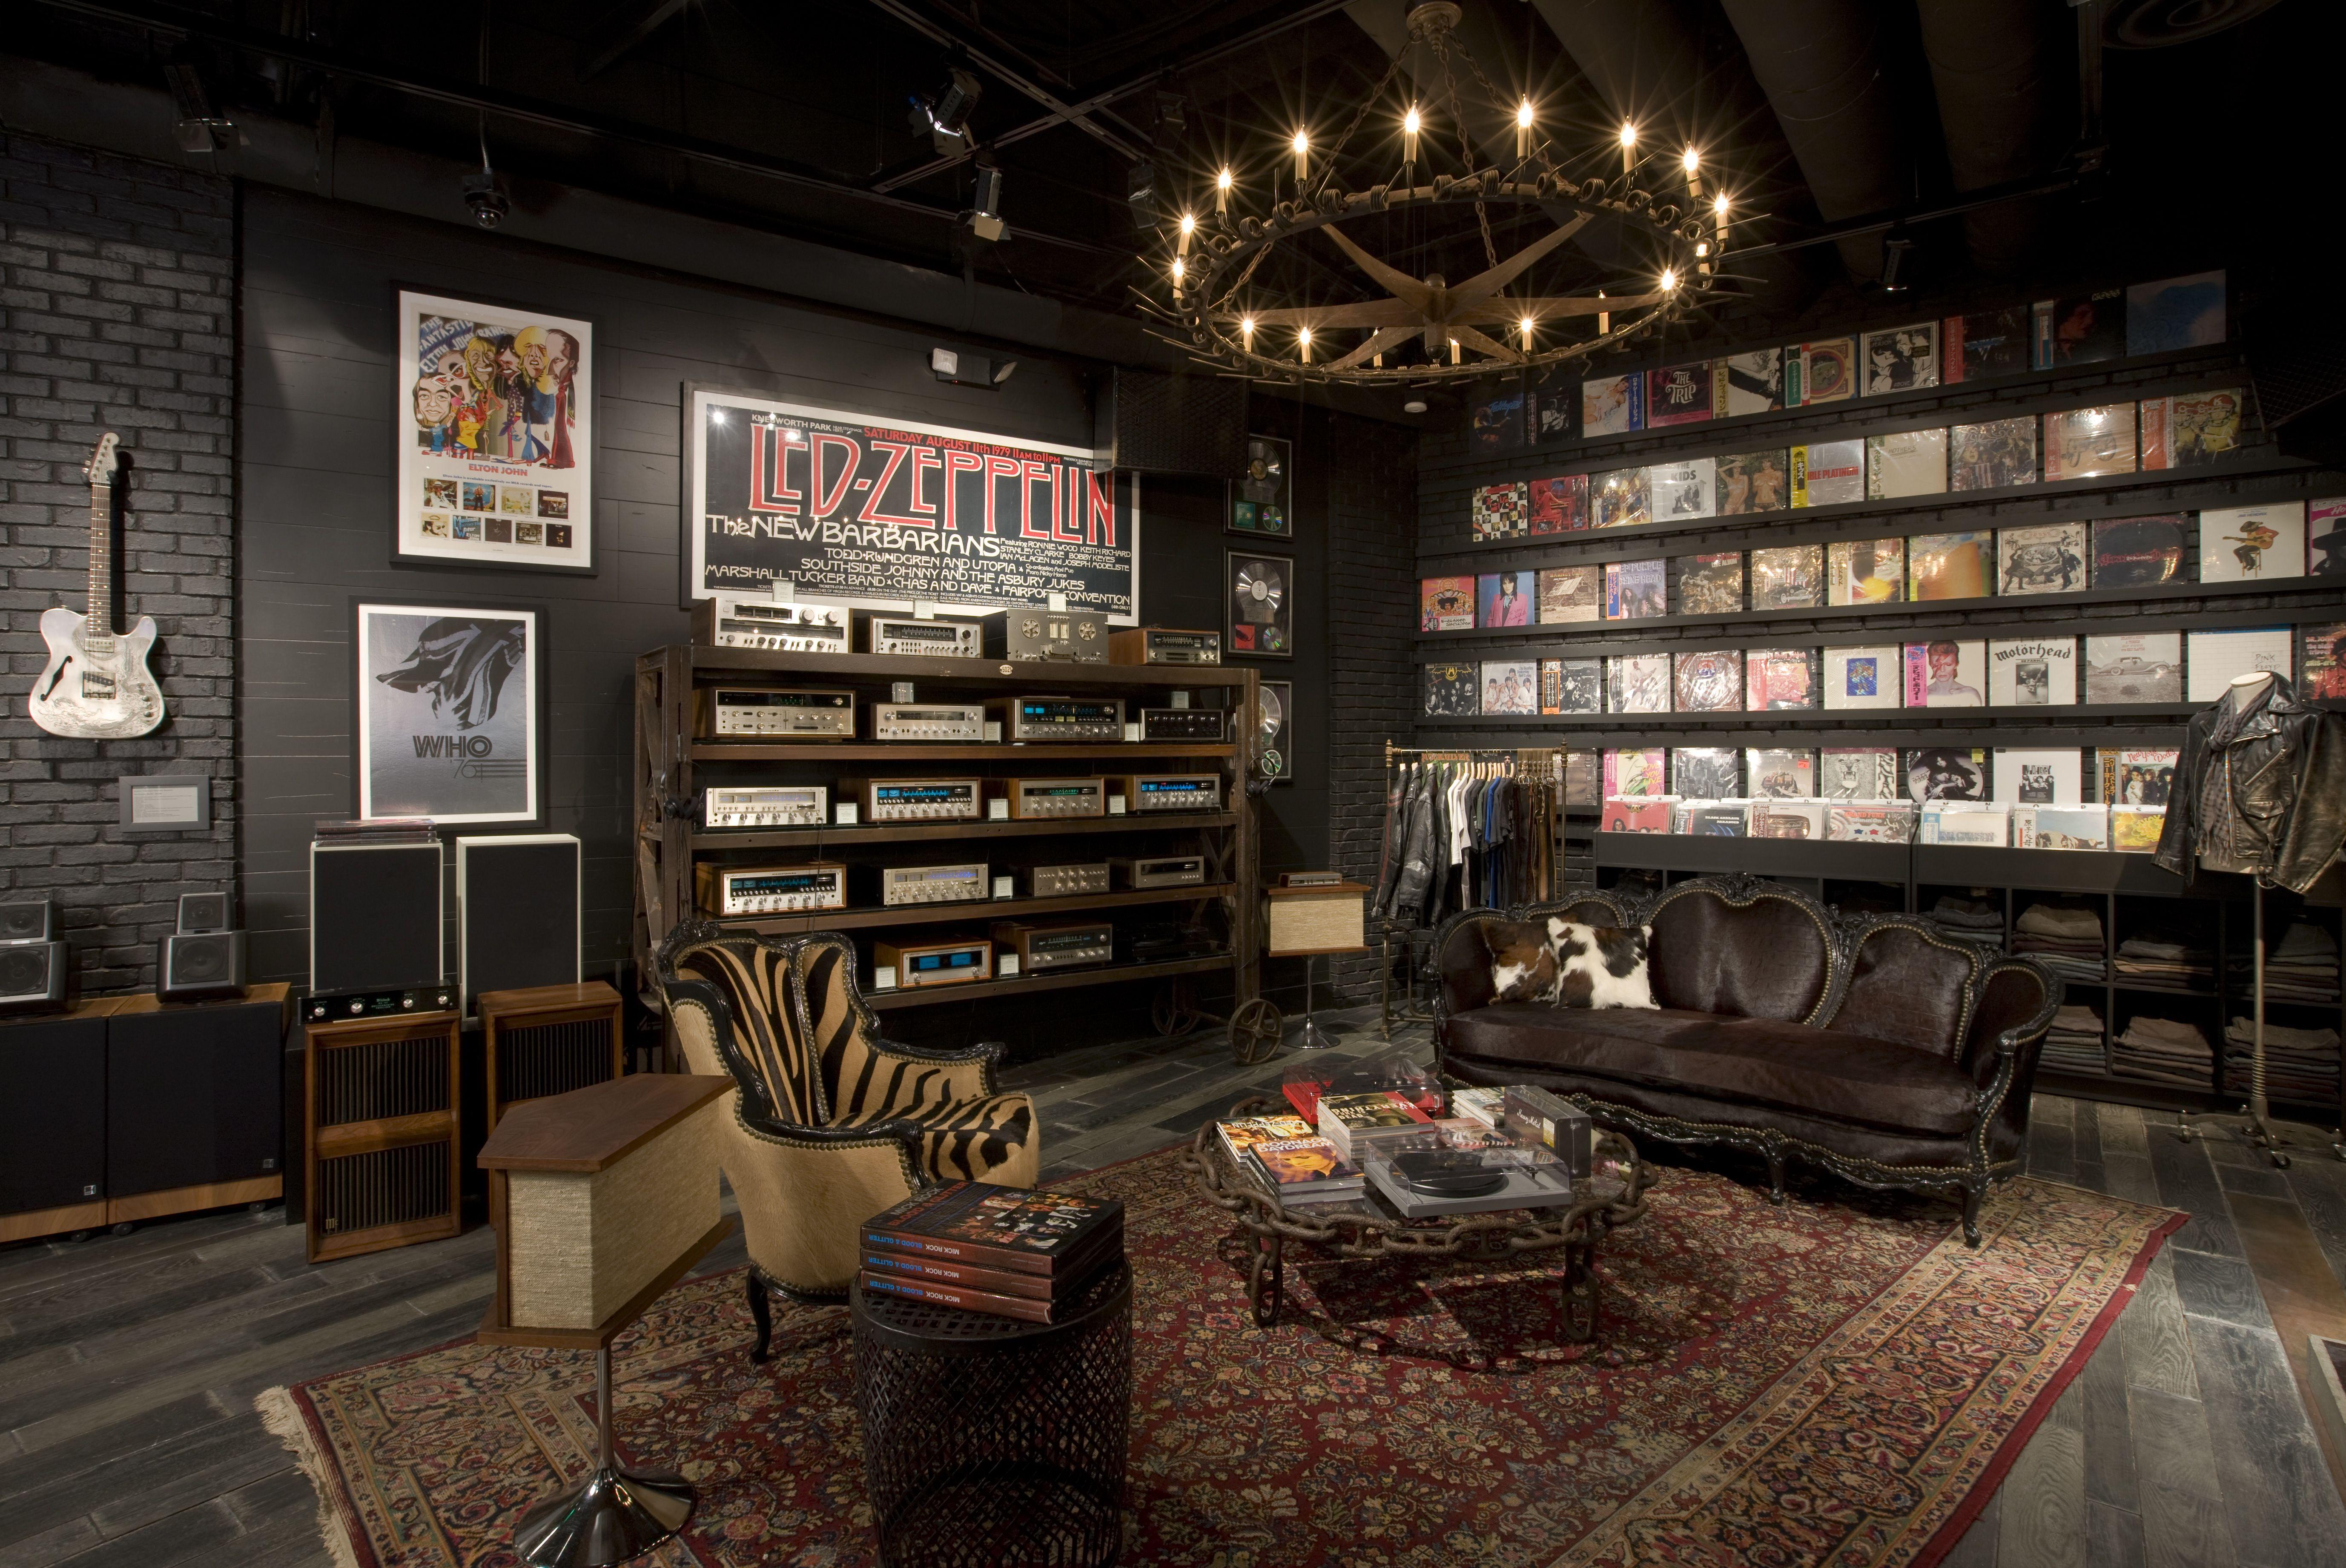 John Varvatos Boutique Hard Rock Las Vegas Nv Home Music Rooms Man Cave Home Bar Music Studio Room